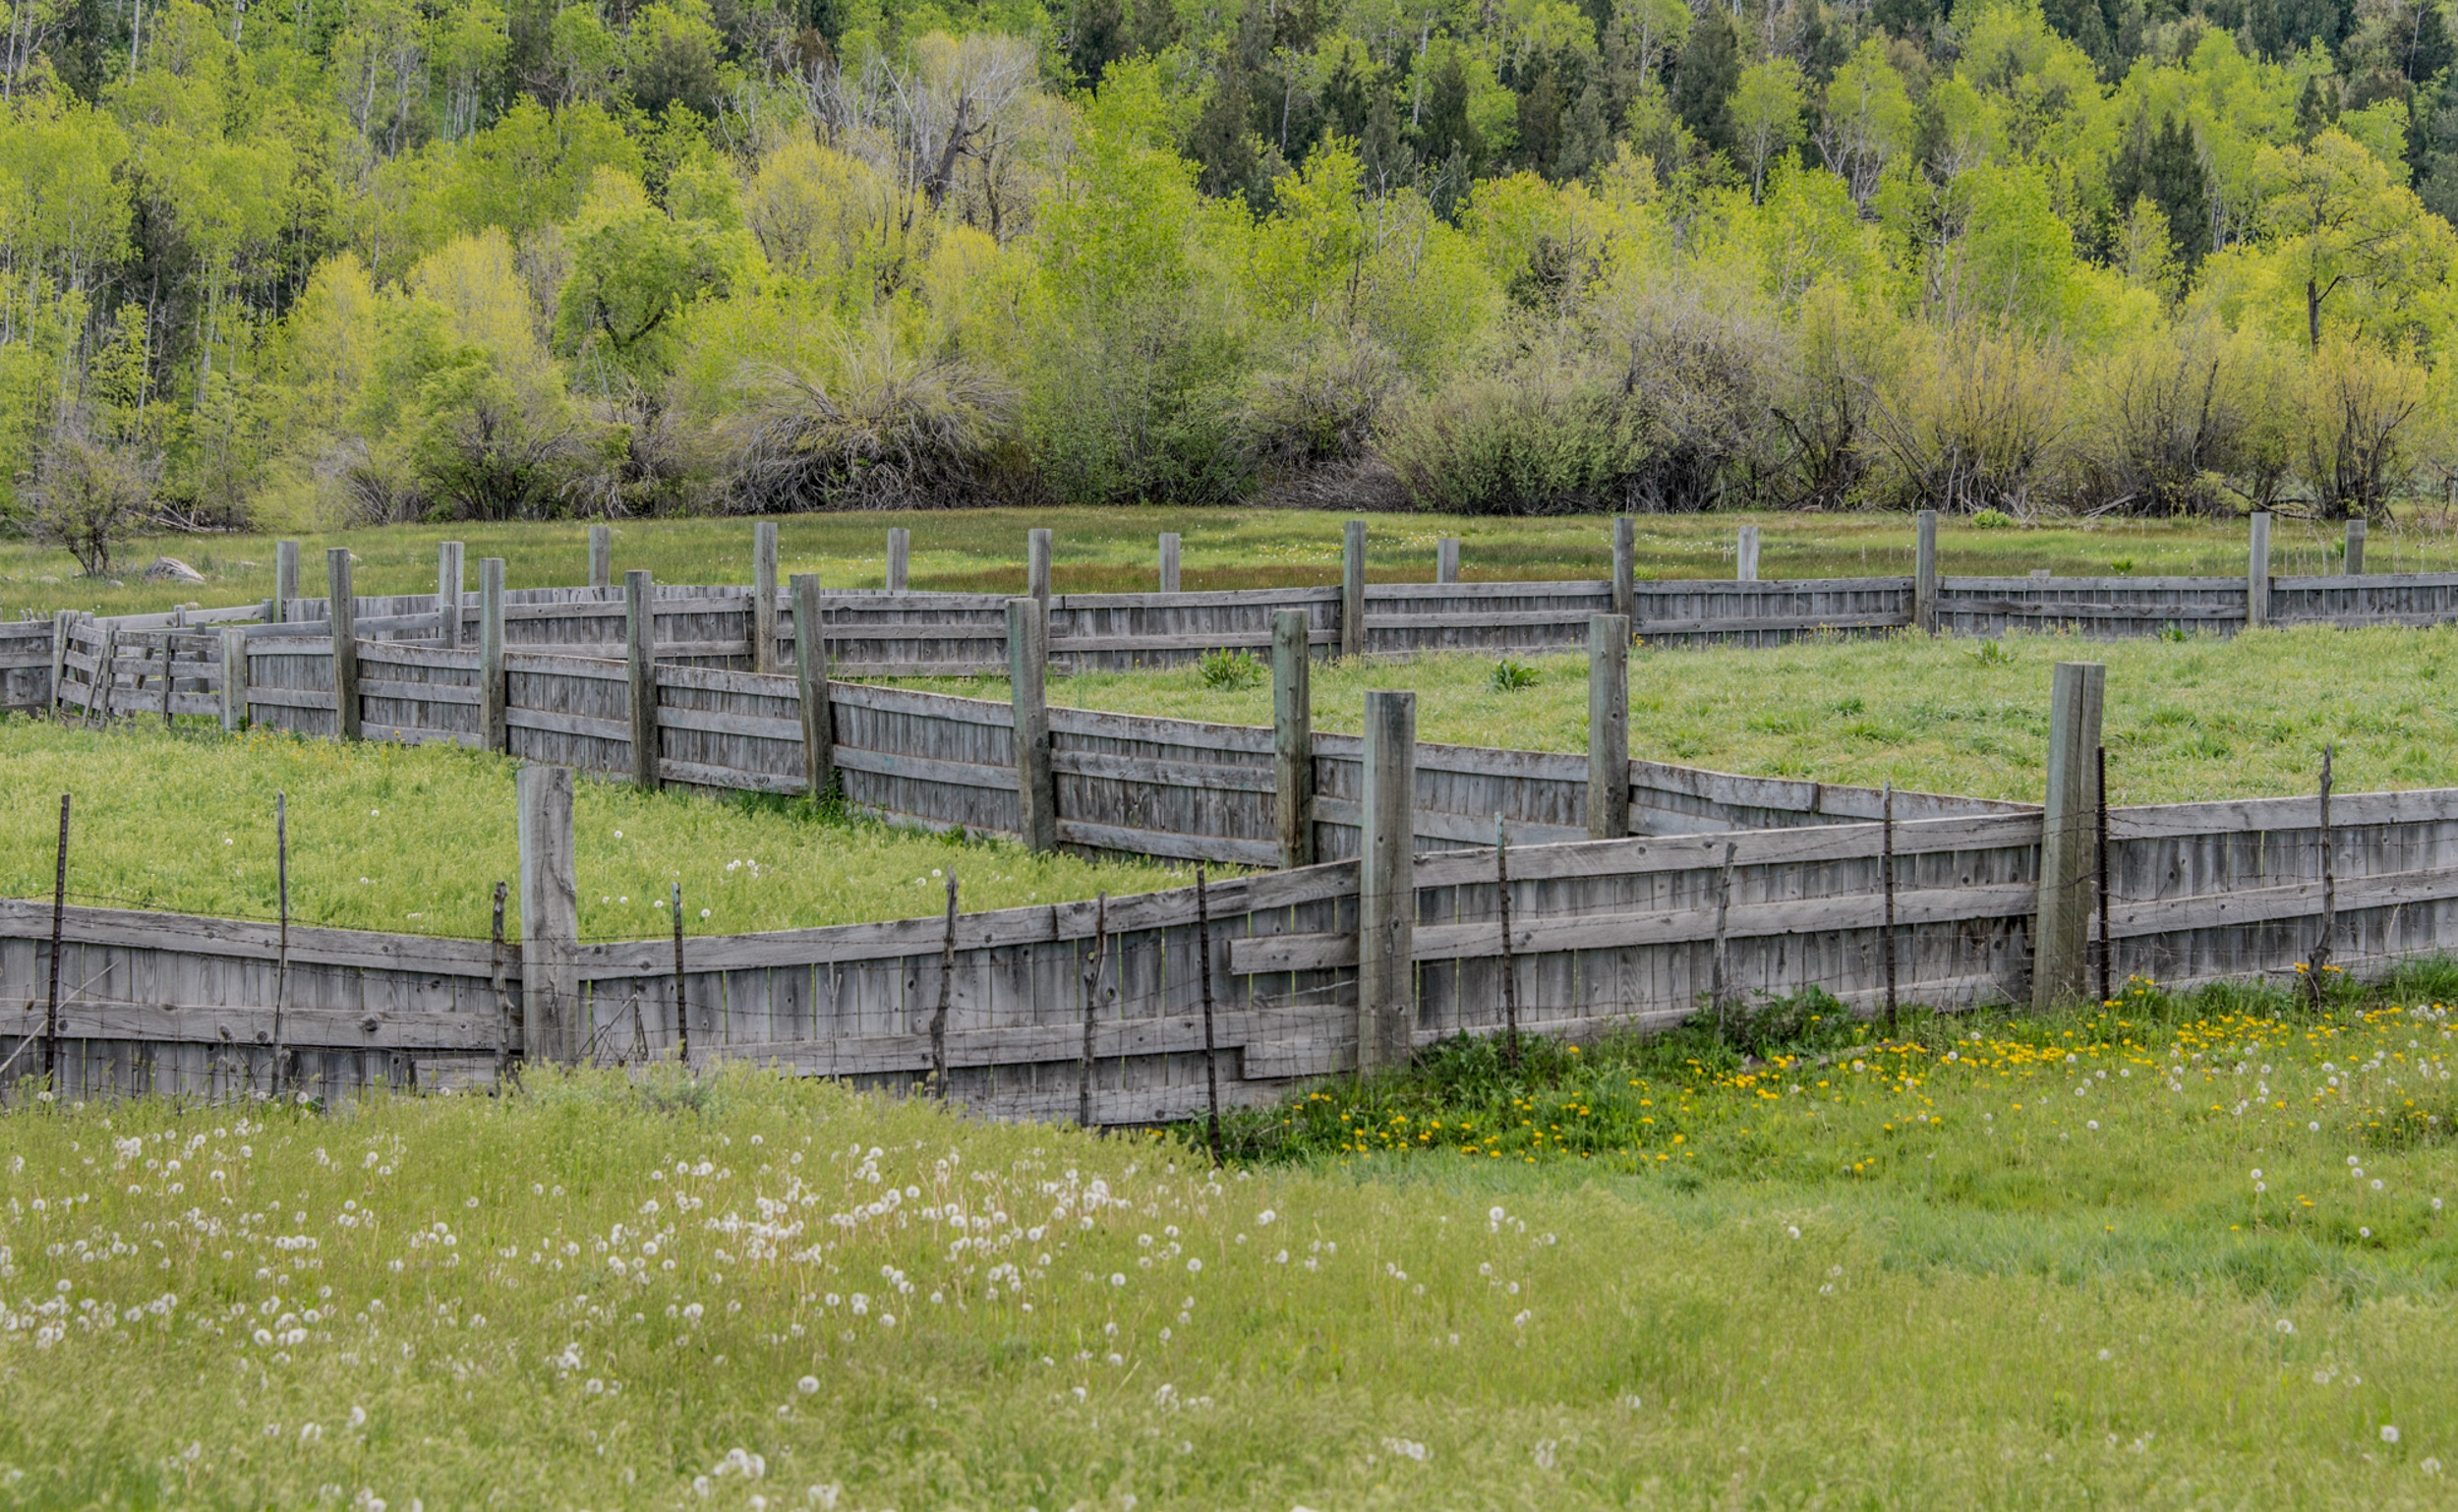 Corral Near Eden, Utah © Robert Welkie 2017